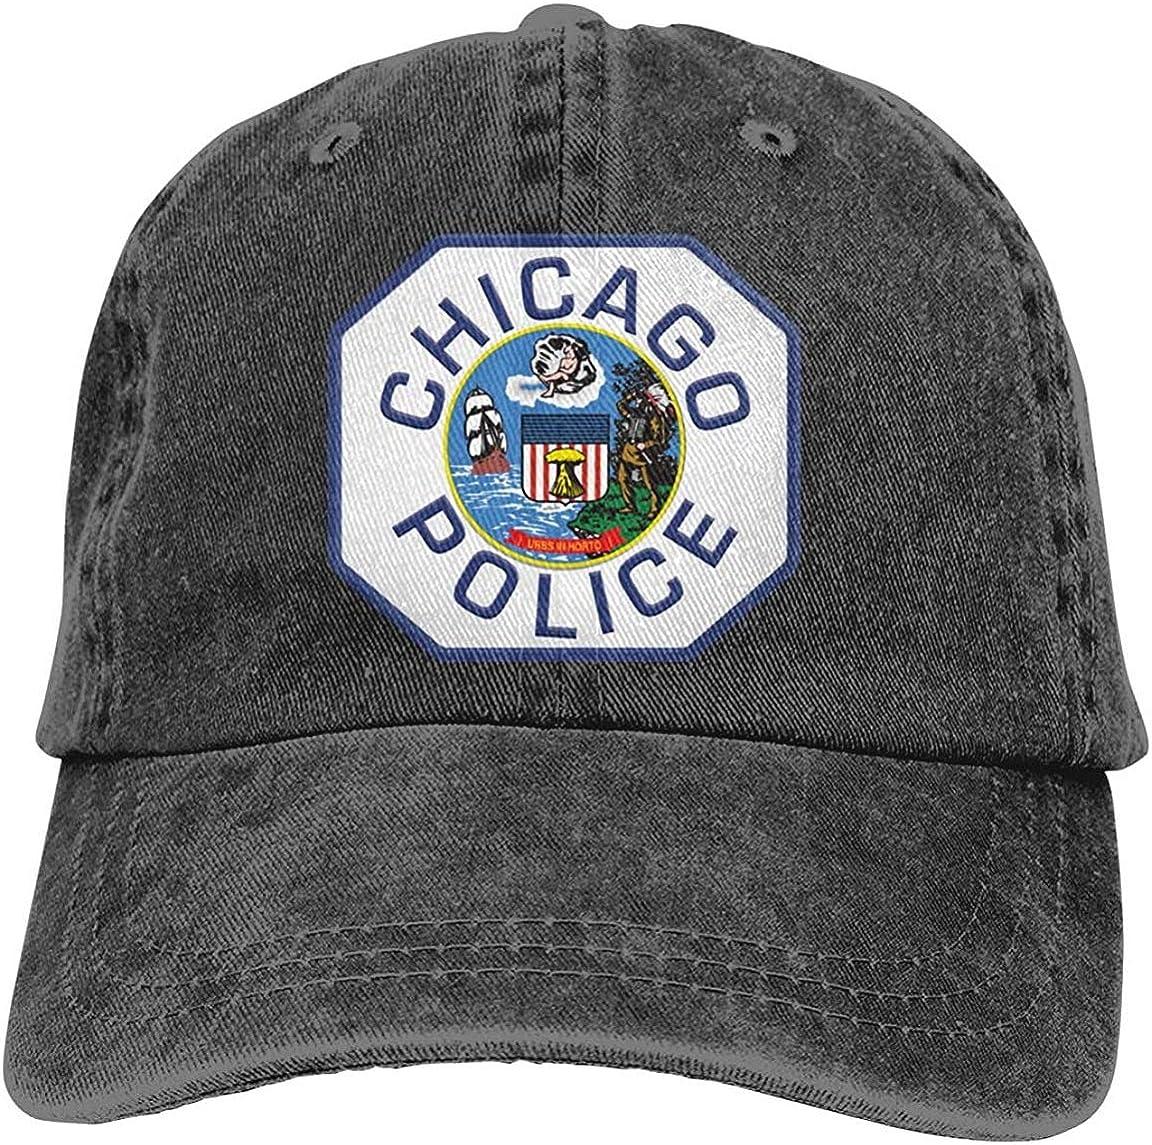 US Air Force 445th Airlift Wing Unisex Cotton Hat Vintage Adjustable Baseball Cap Fashion Hip Hop Hat